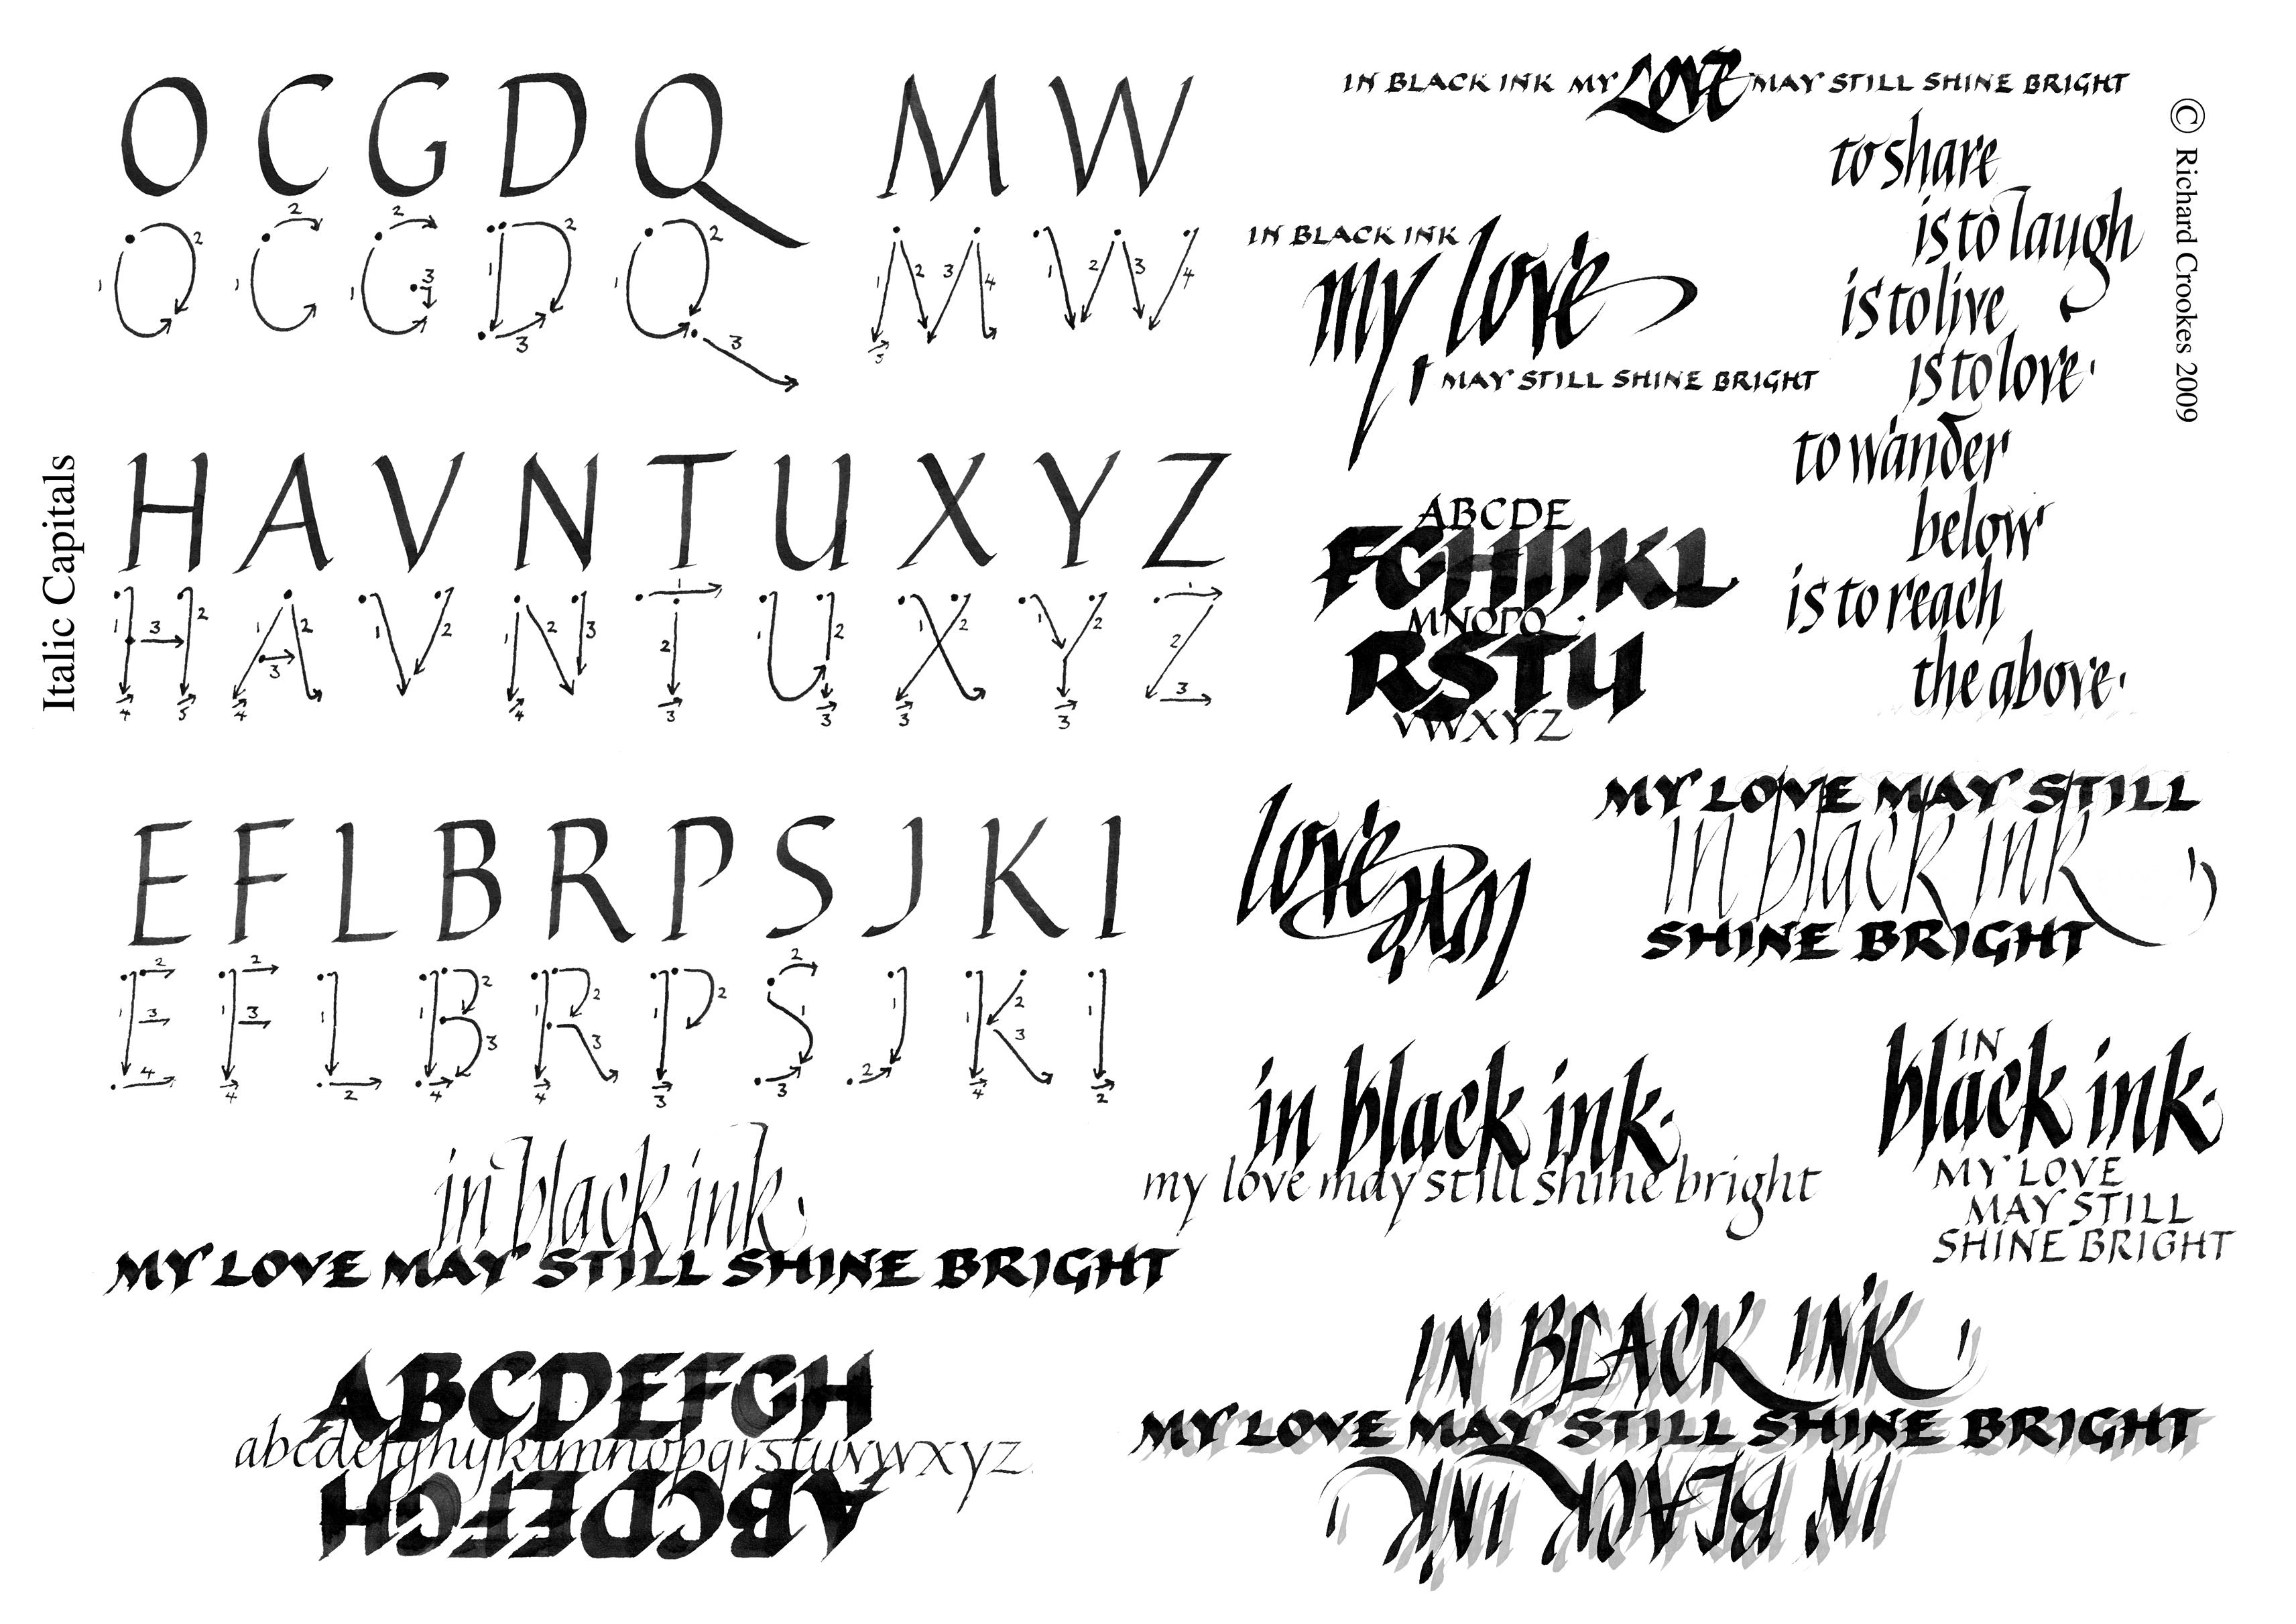 16 Best Images Of Verbs And Helping Verbs Worksheet